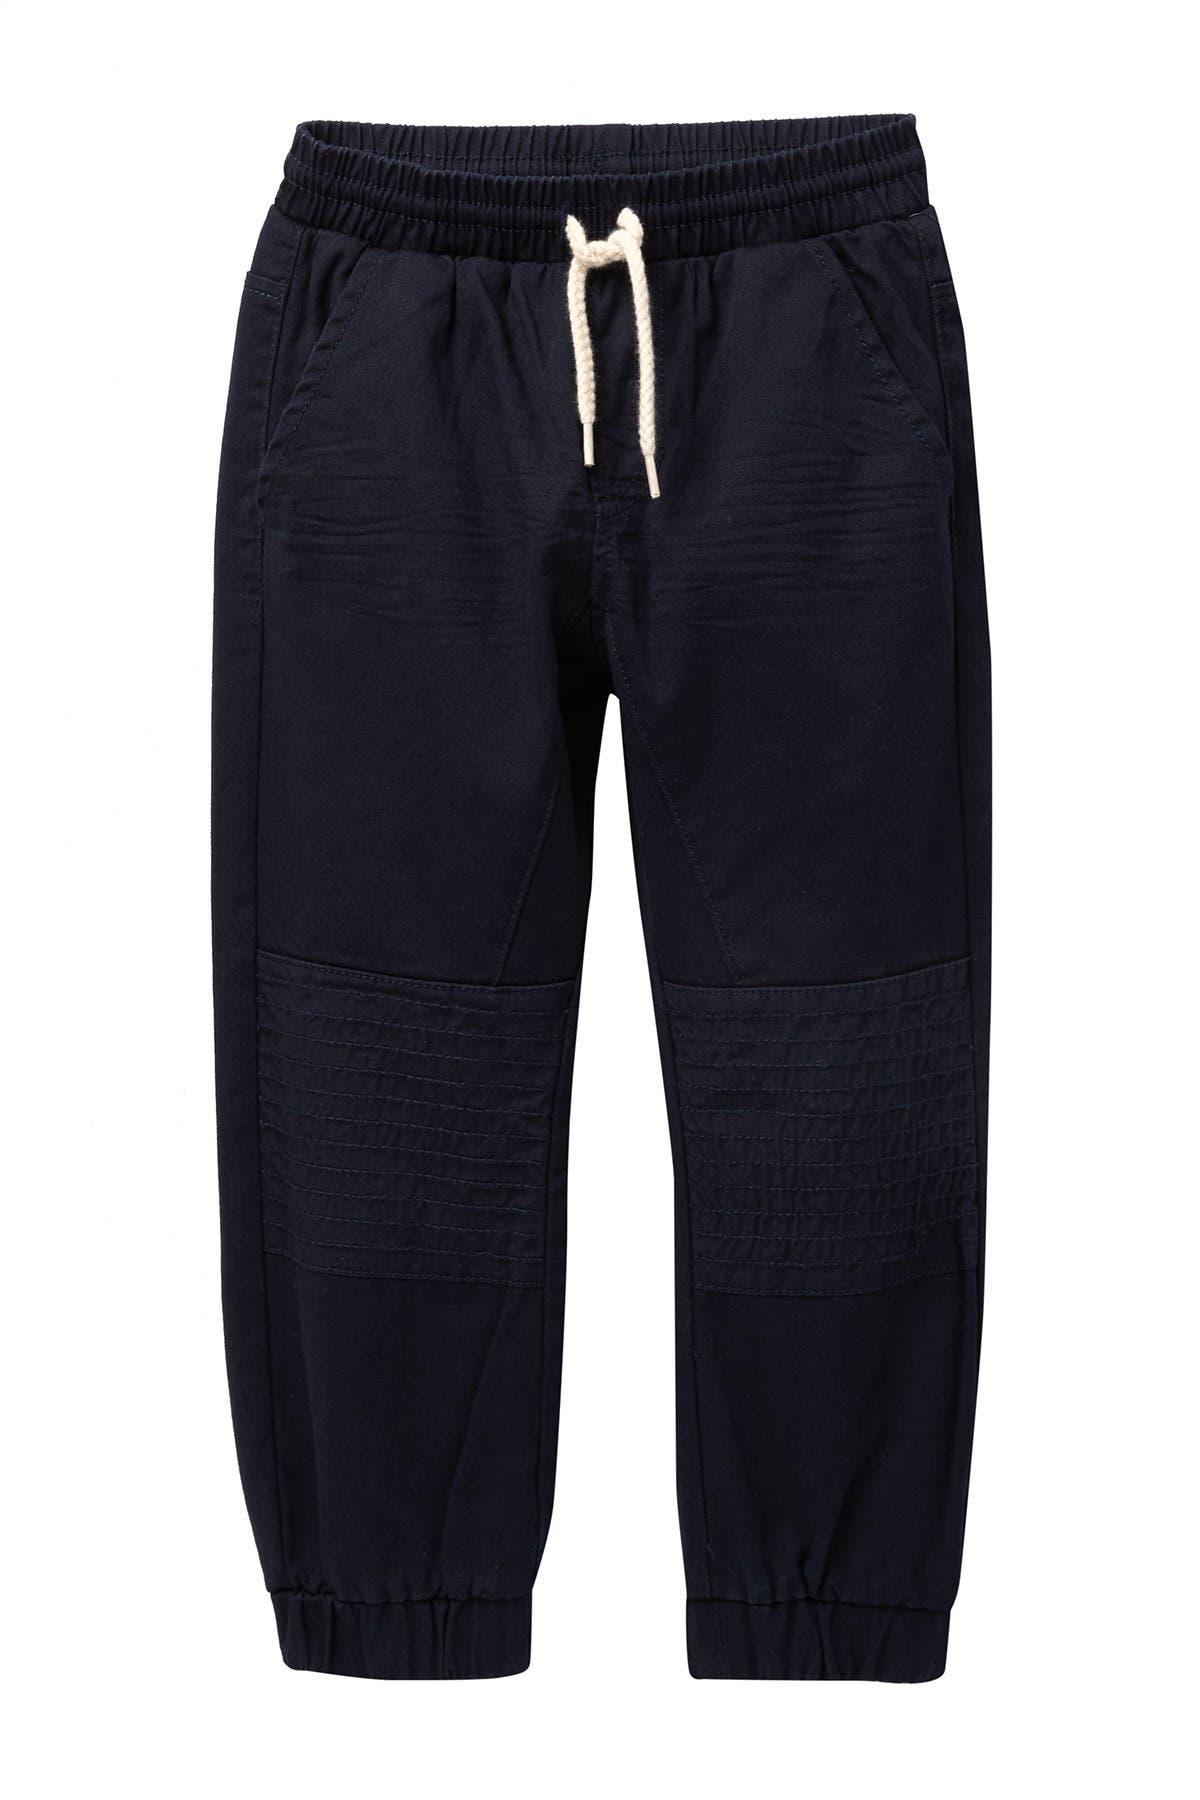 Image of Petit Lem Woven Pants